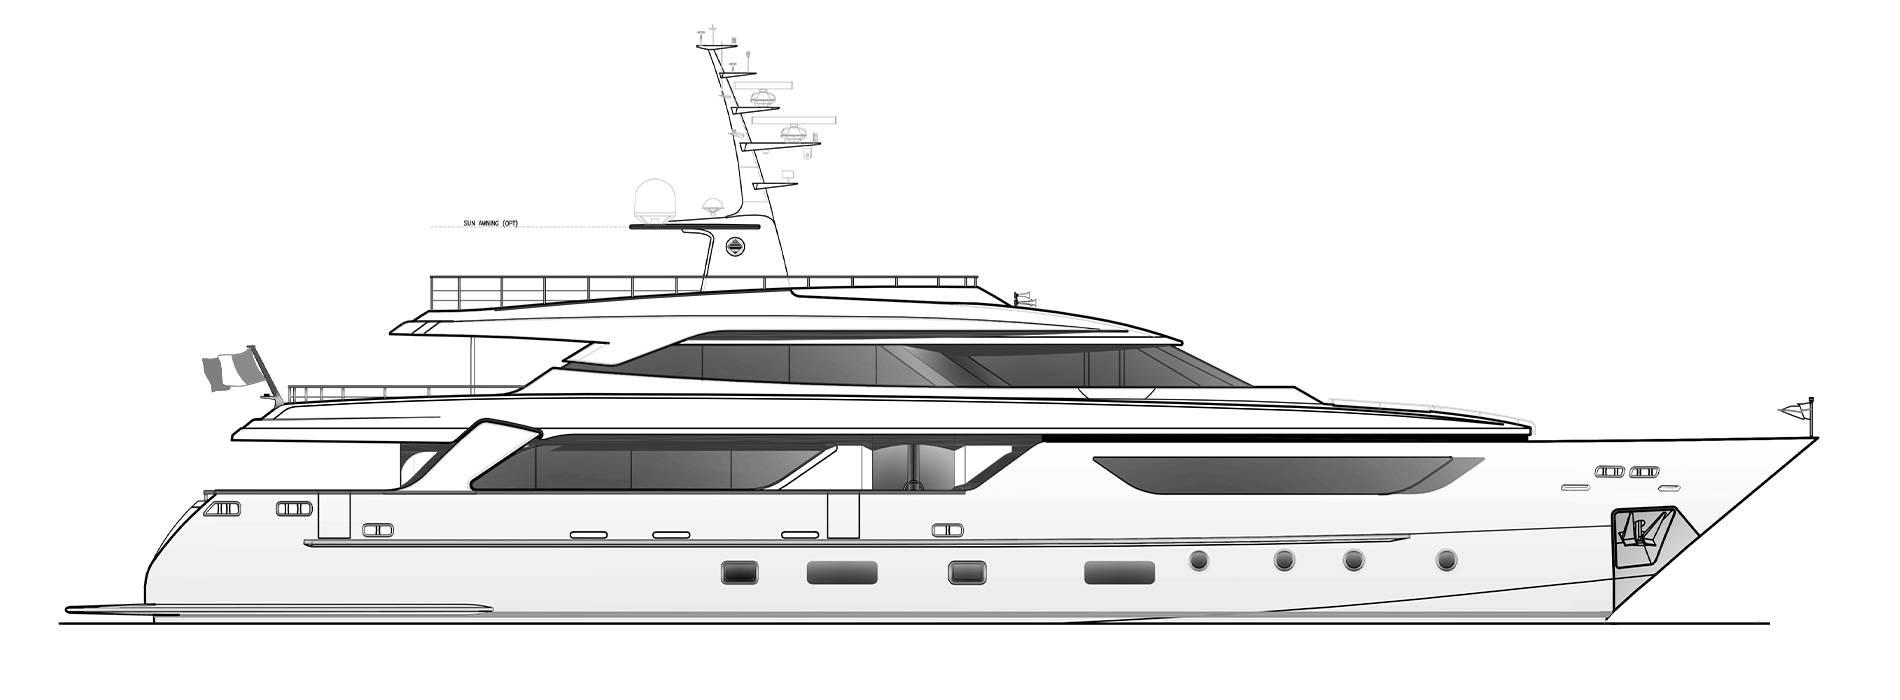 Sanlorenzo Yachts SD122-27 under offer Profil